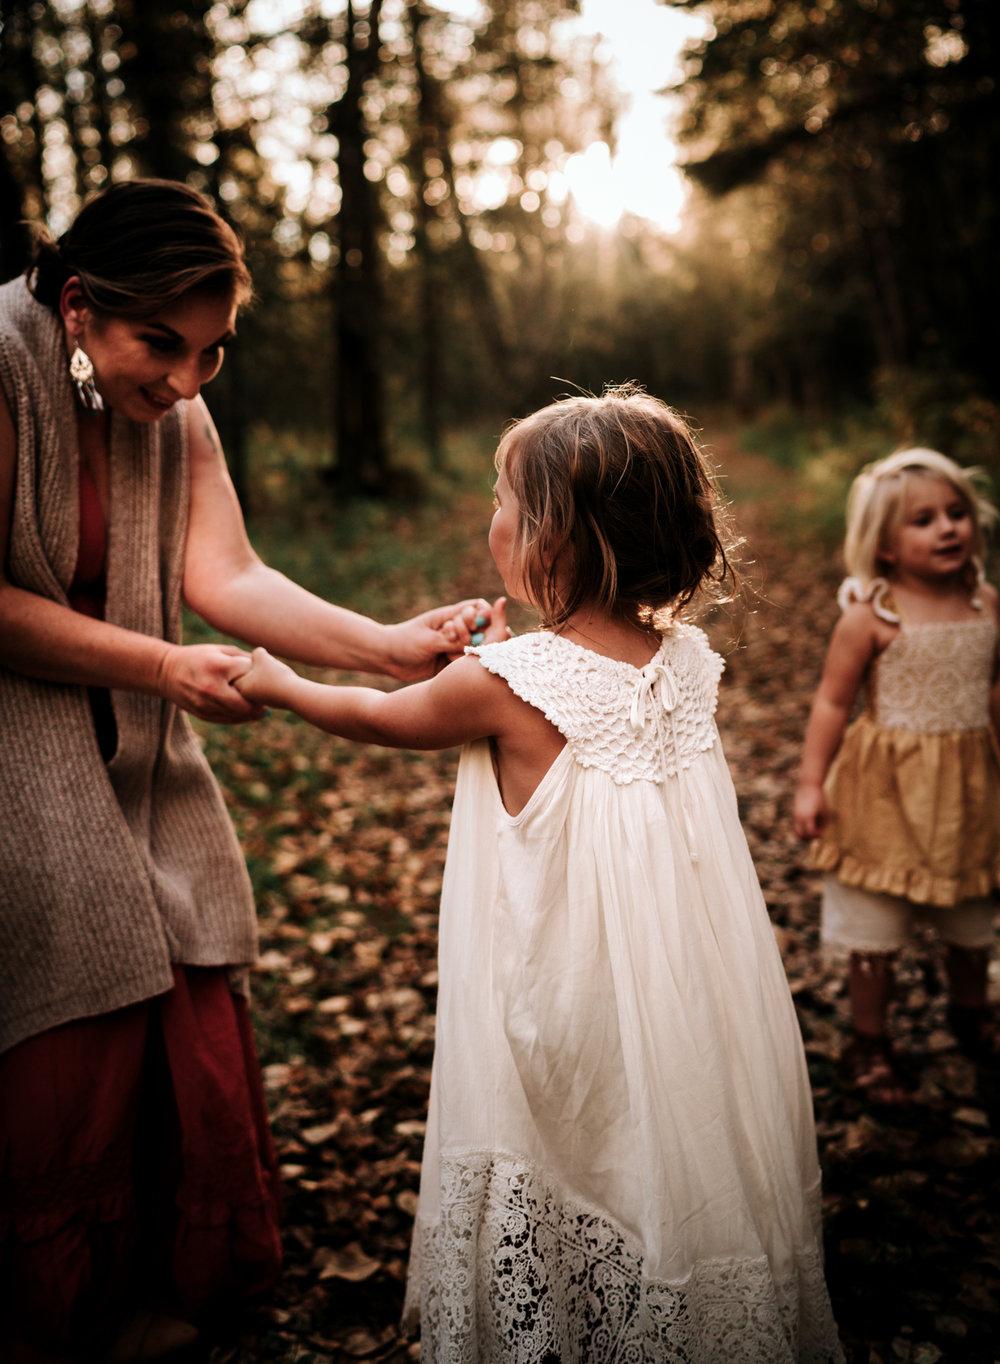 anchoragefamilyphotographer46.jpg